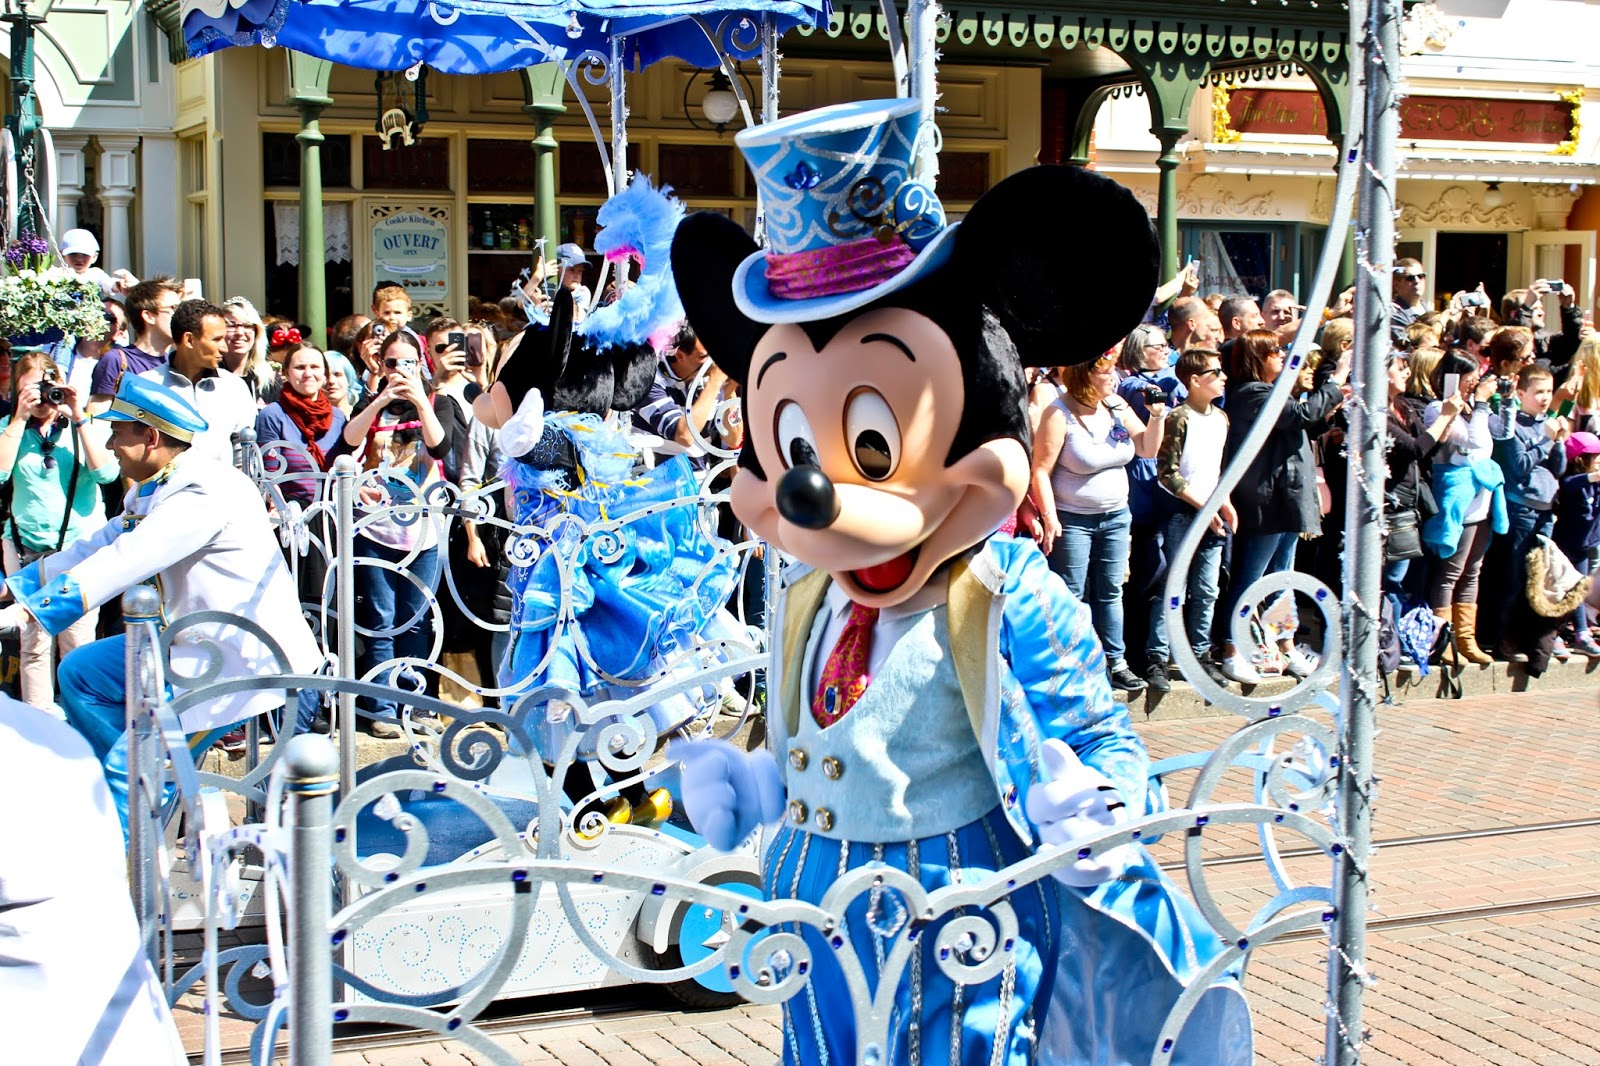 Joyeux Anniversaire Disneyland Paris Mademoiselle Jude Blogueuse